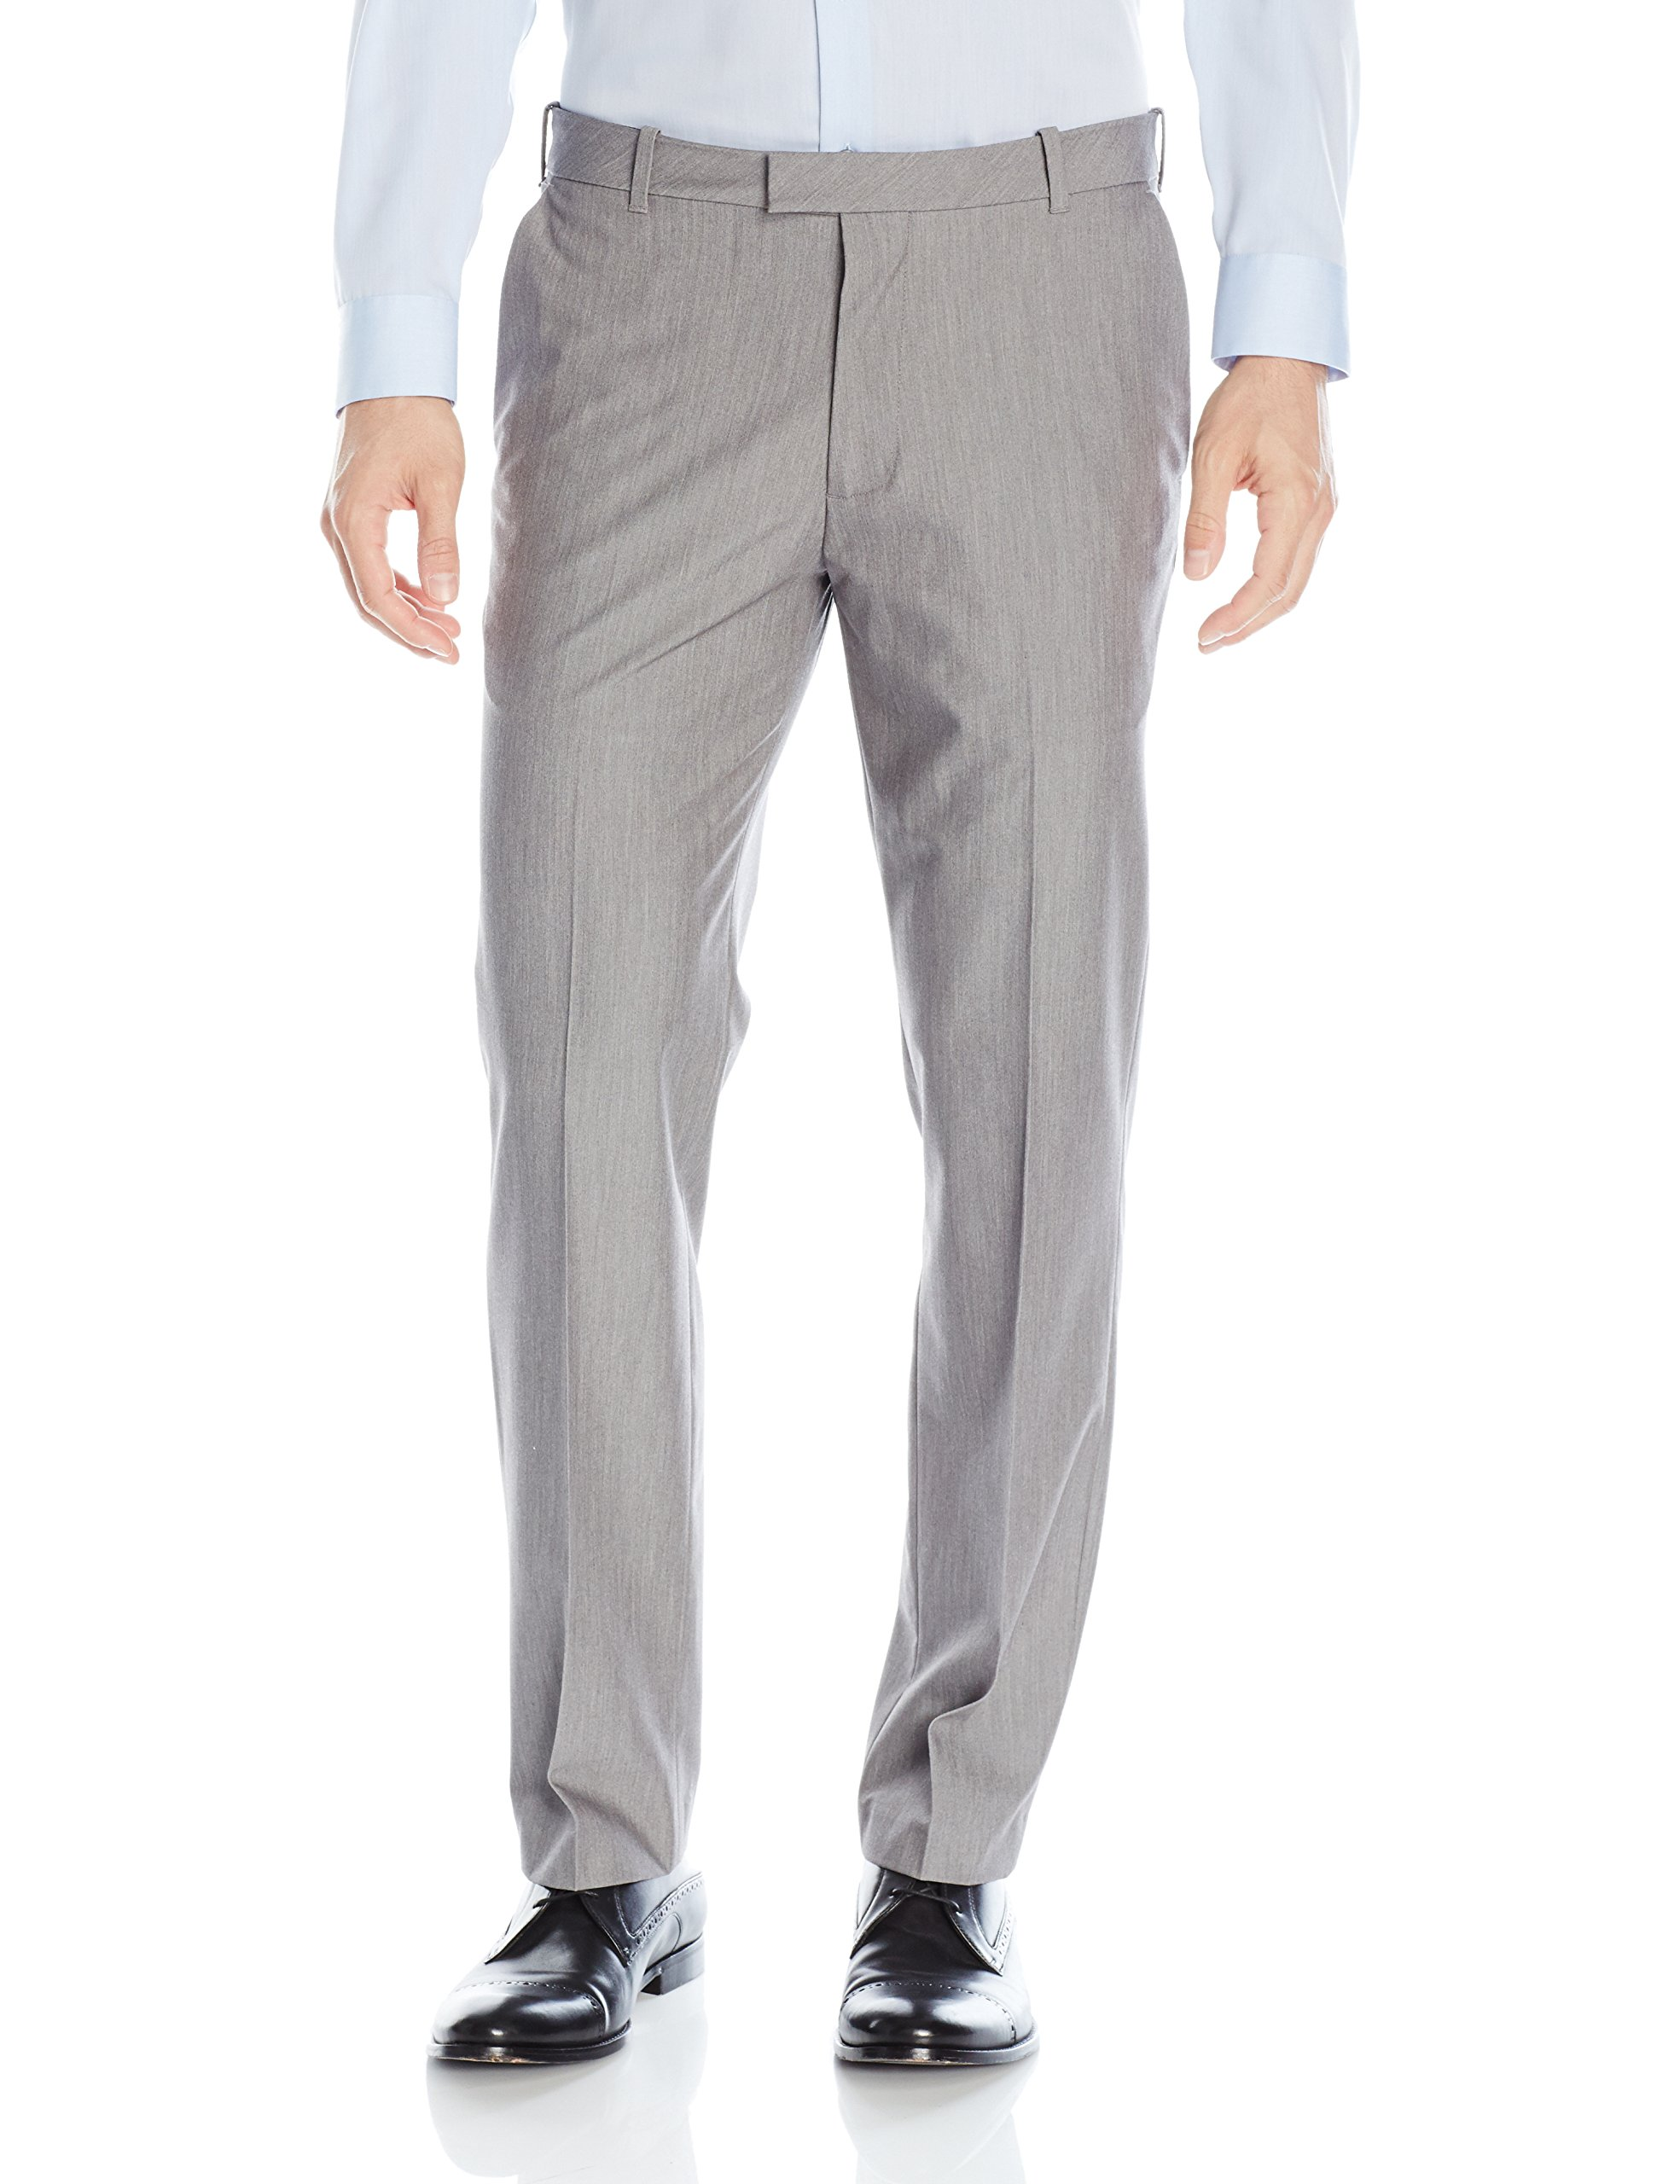 Van Heusen Men's Flex Straight Fit Flat Front Pant, Silver Grey, 33W x 30L